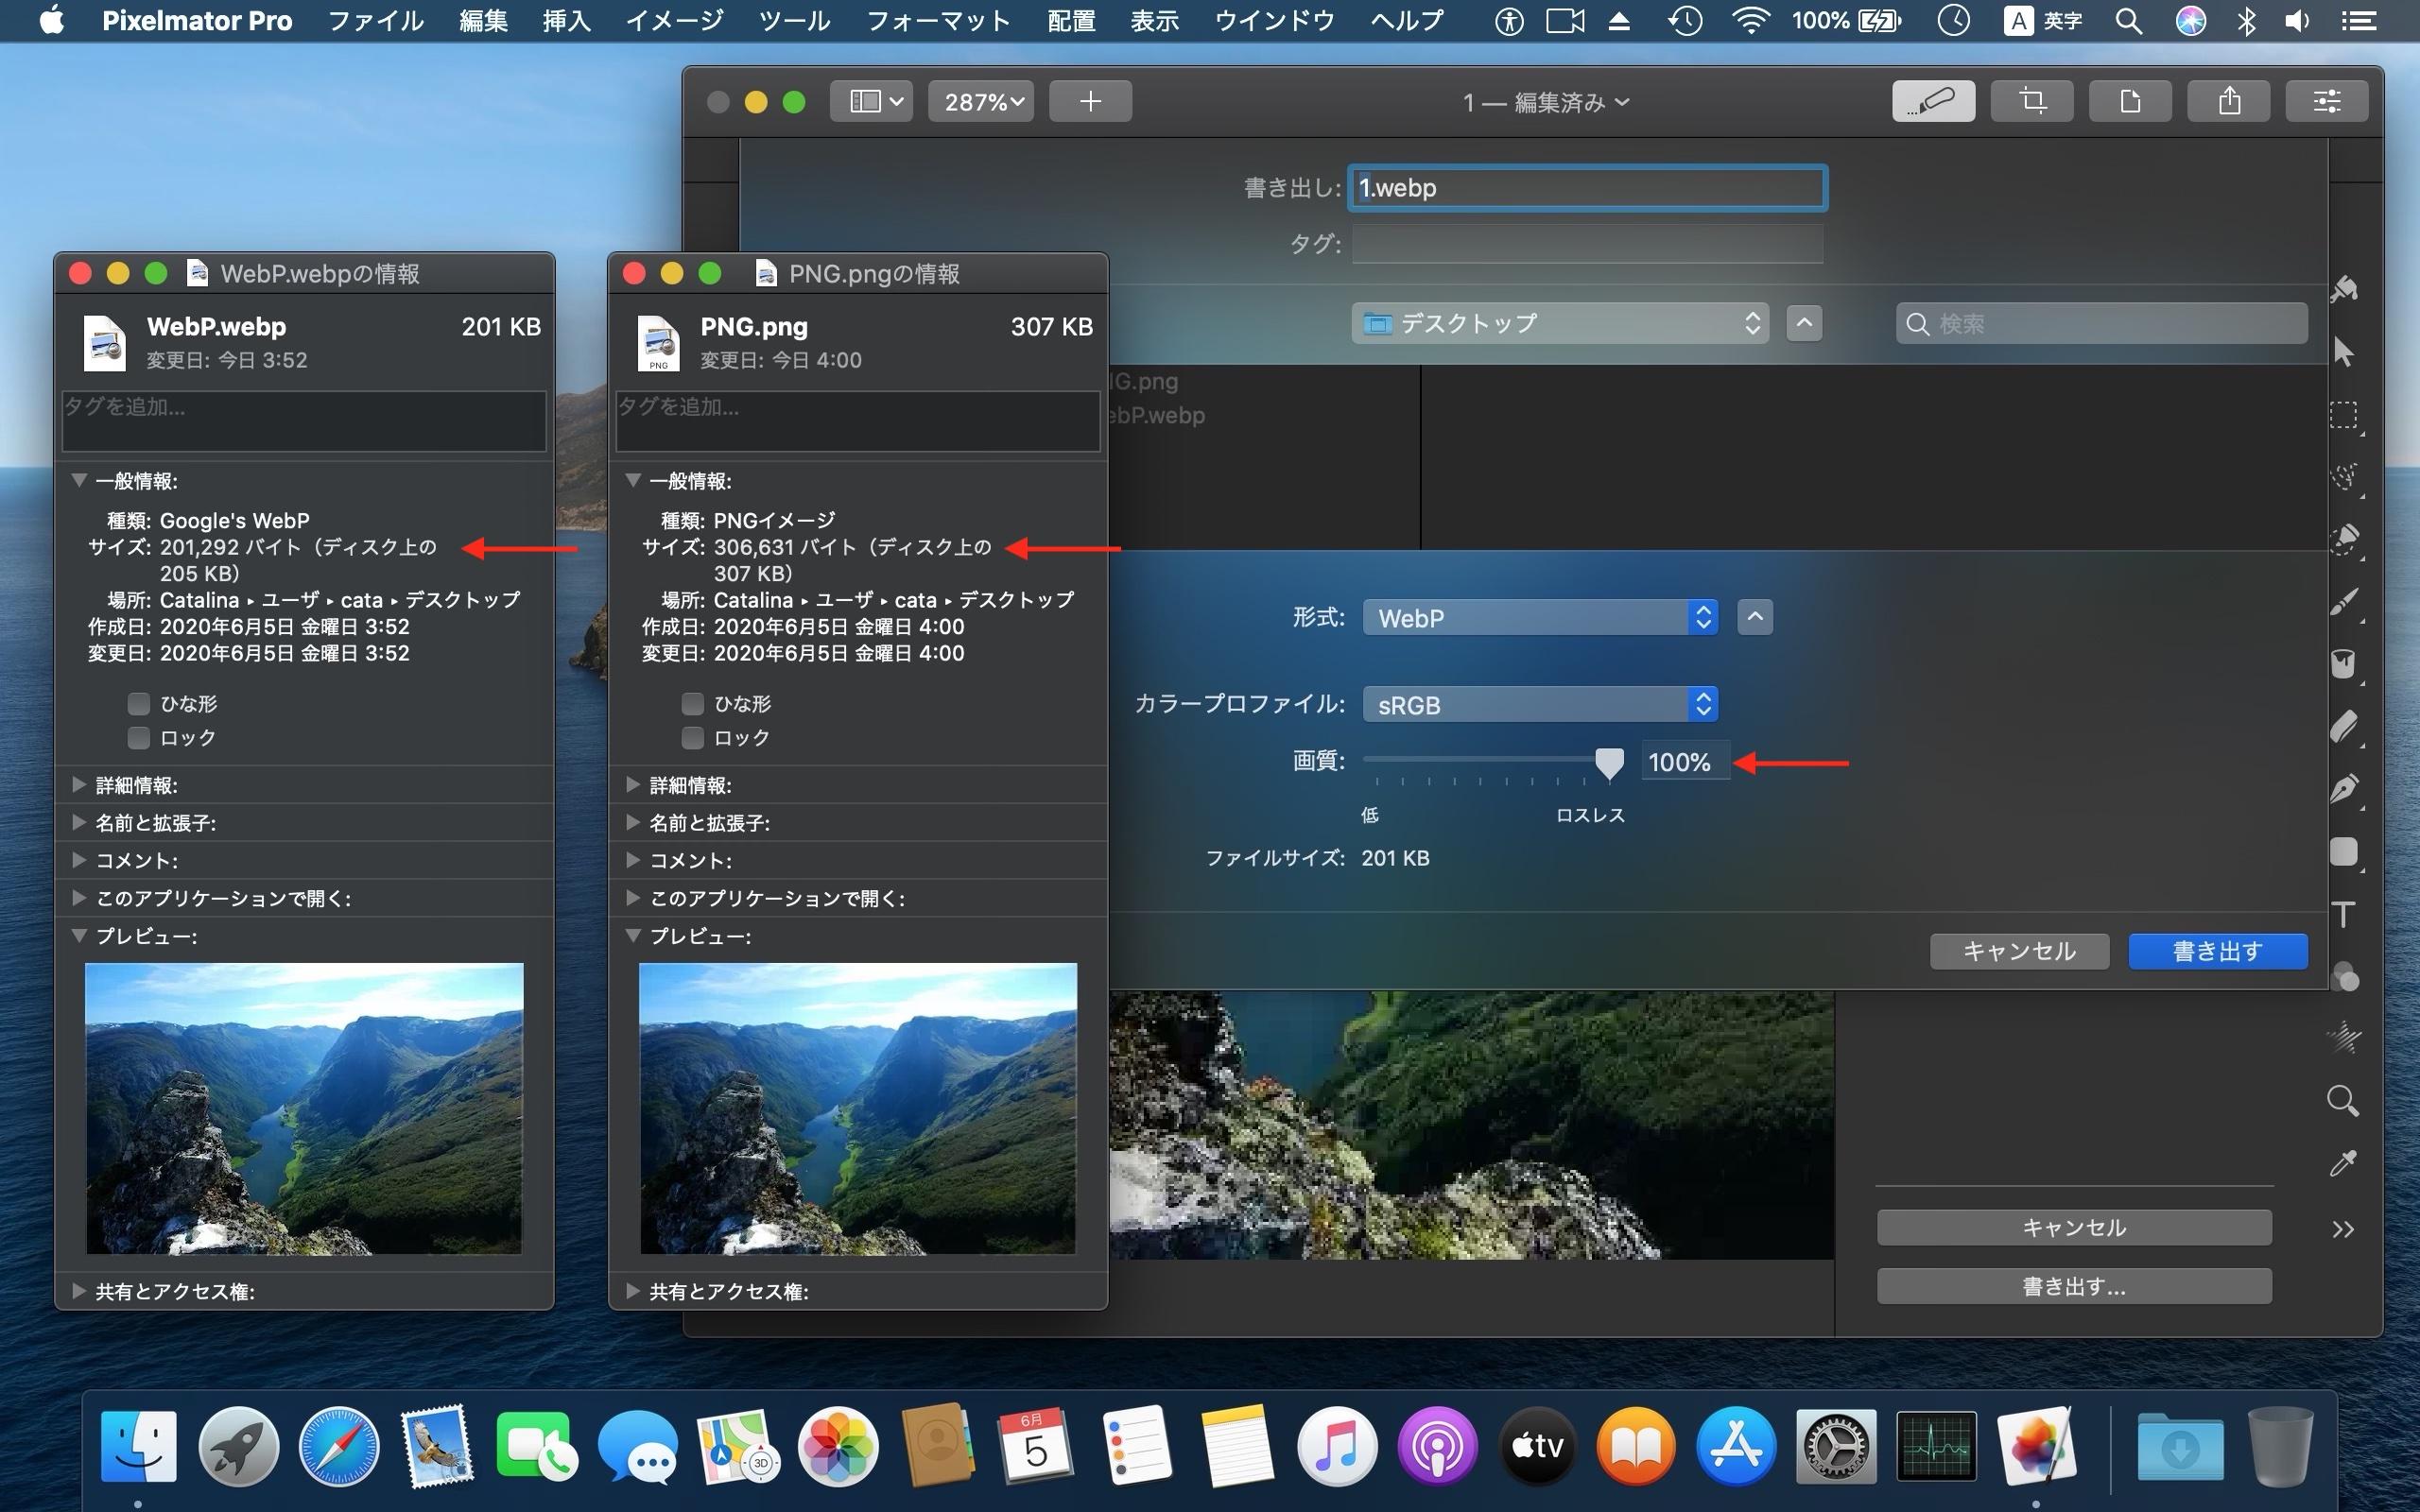 Pixelmator Pro for MacでWebP可逆(ロスレス)/非可逆圧縮